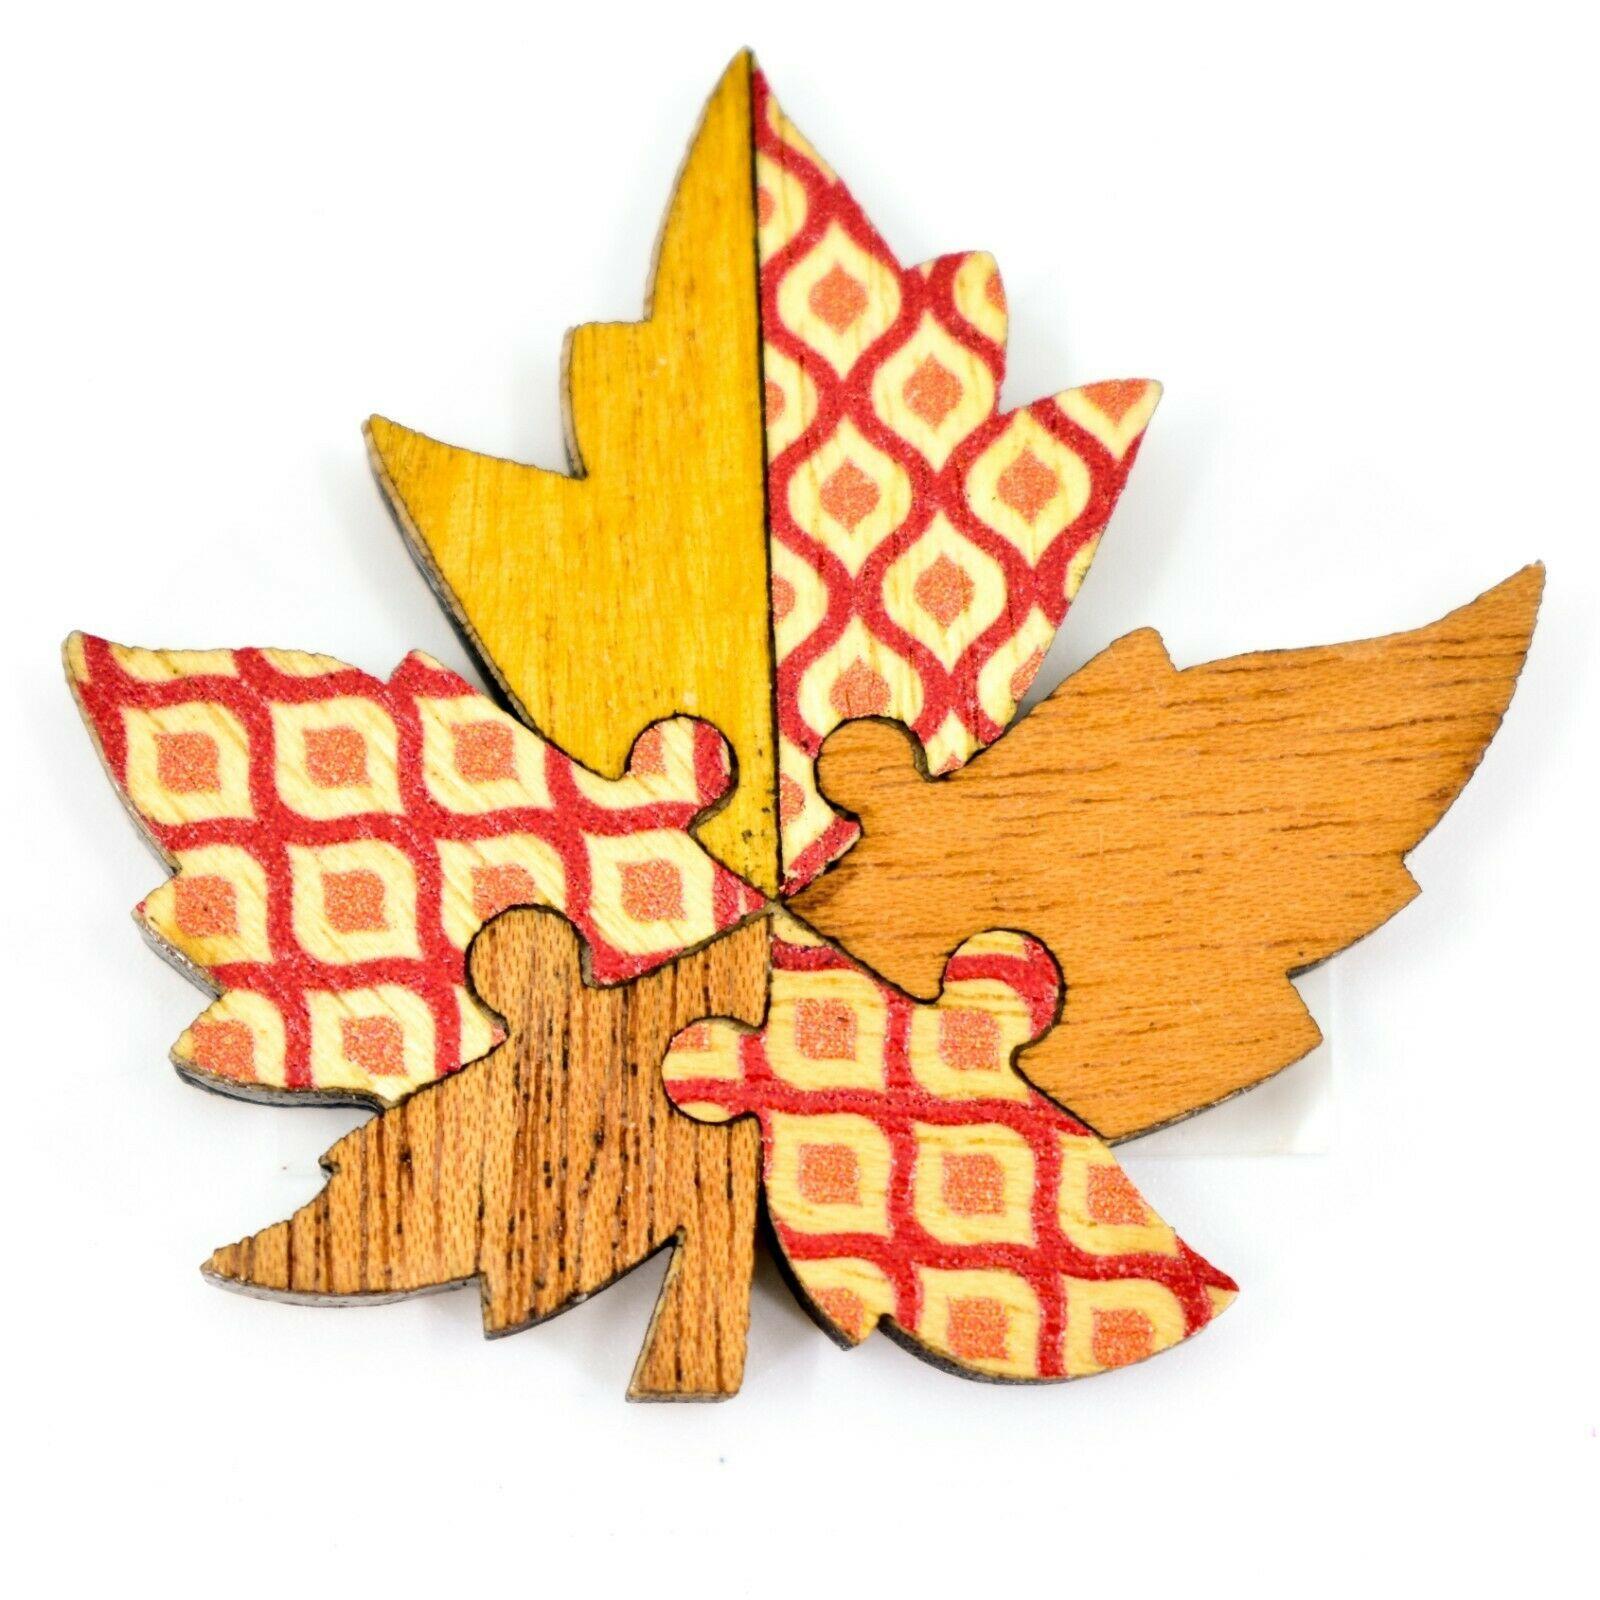 Northwoods Wood Cutout Maple Leaf Jigsaw Puzzle Design Magnet